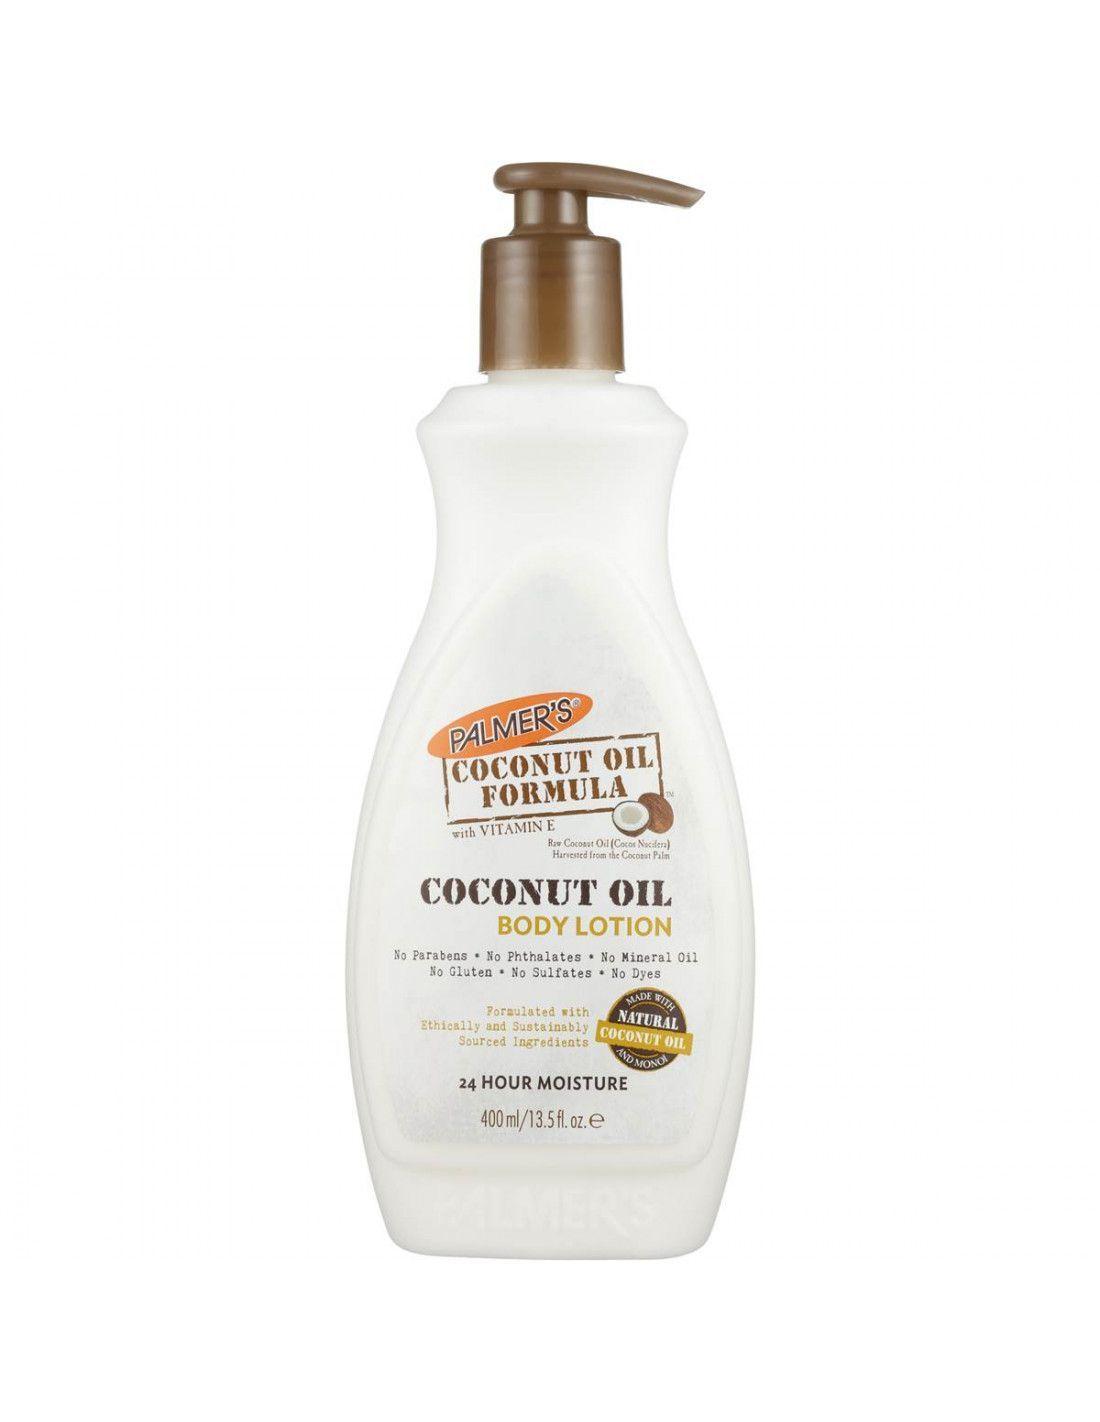 Palmer's Coconut Oil Formula Body Lotion - 400ml